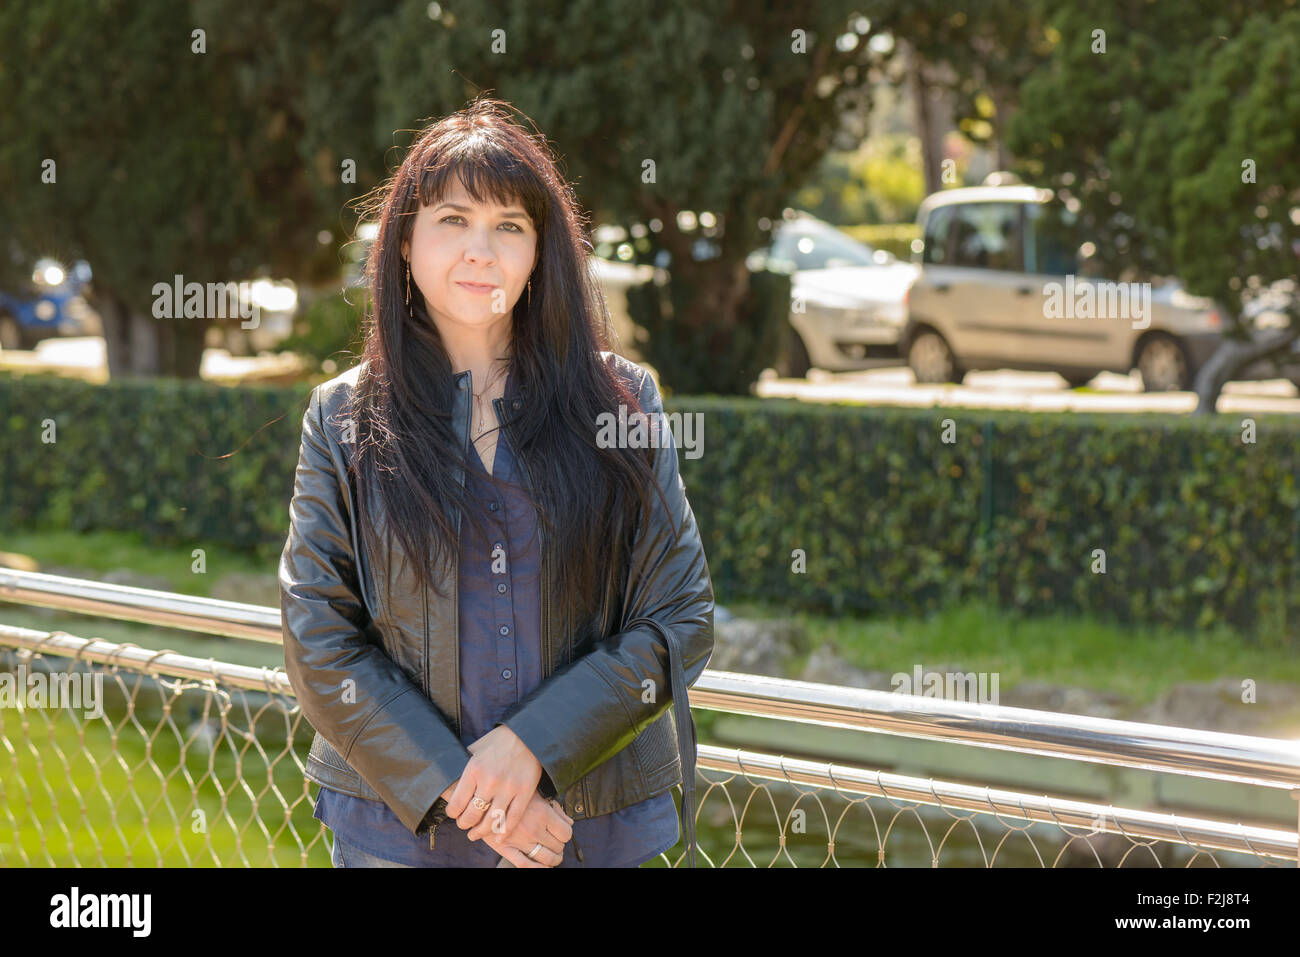 Kinder Garden: Portrait Of An Ukrainian Girl Visiting Rome Stock Photo